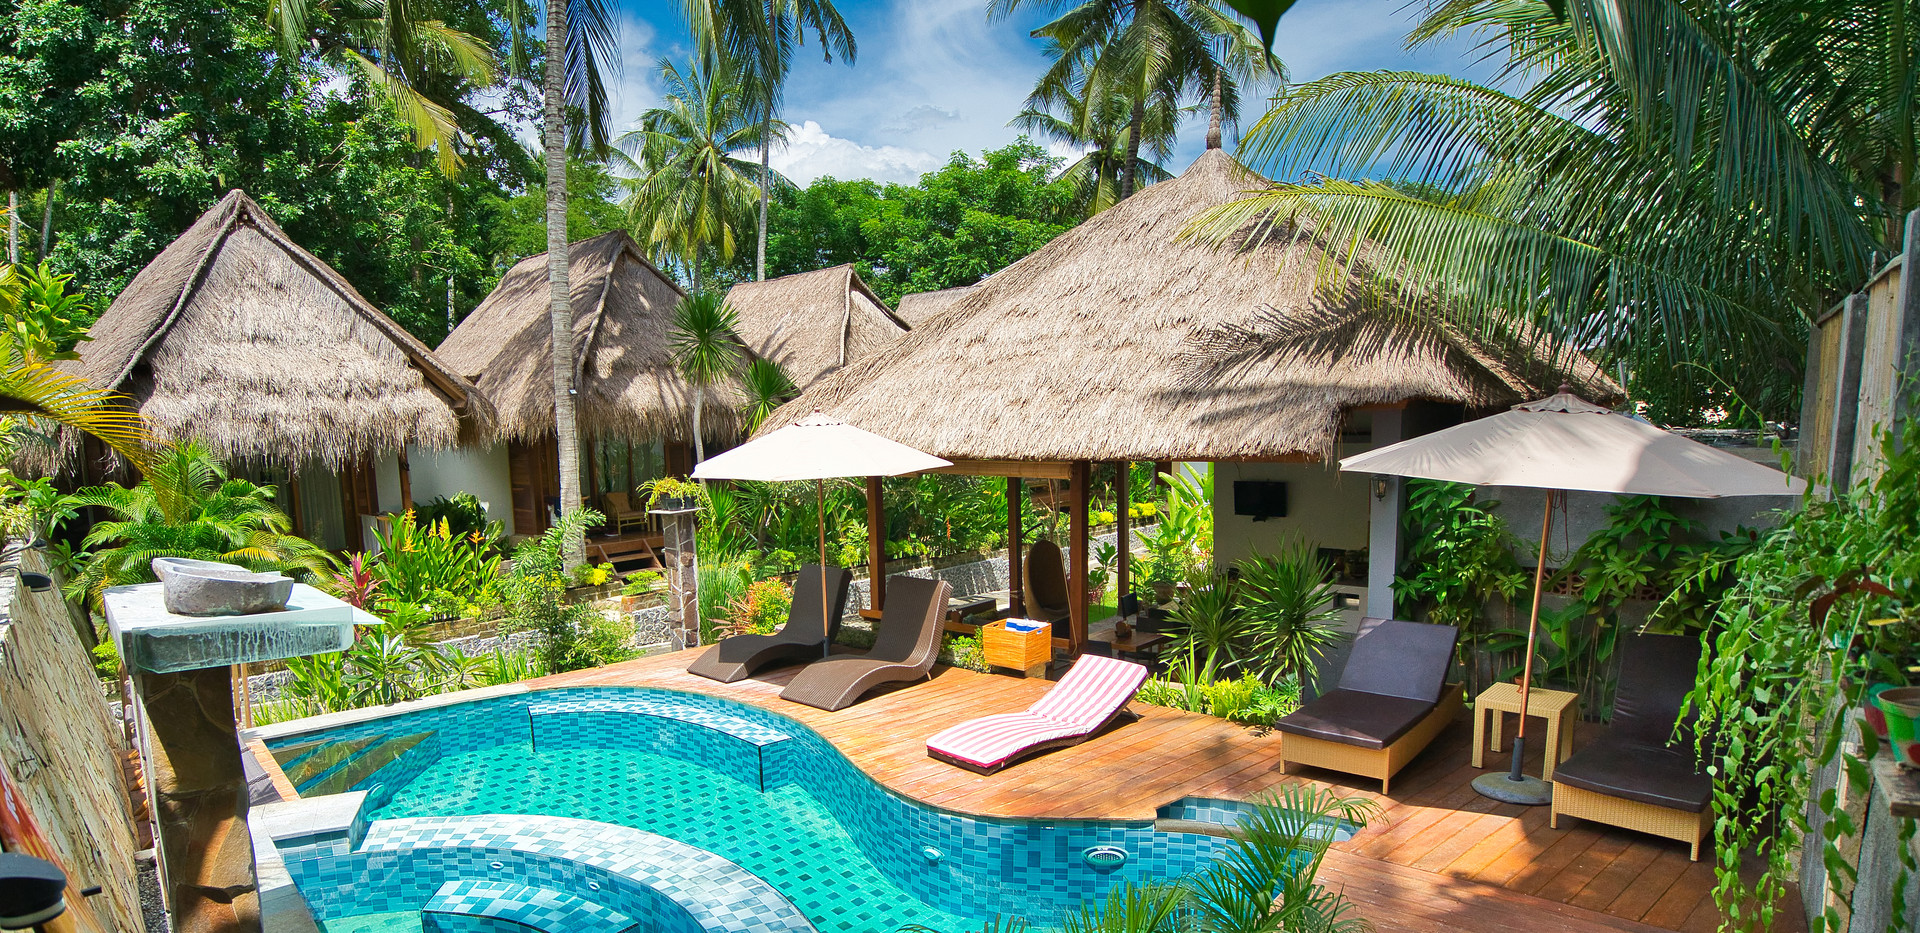 Pool, Restaurant, Palms